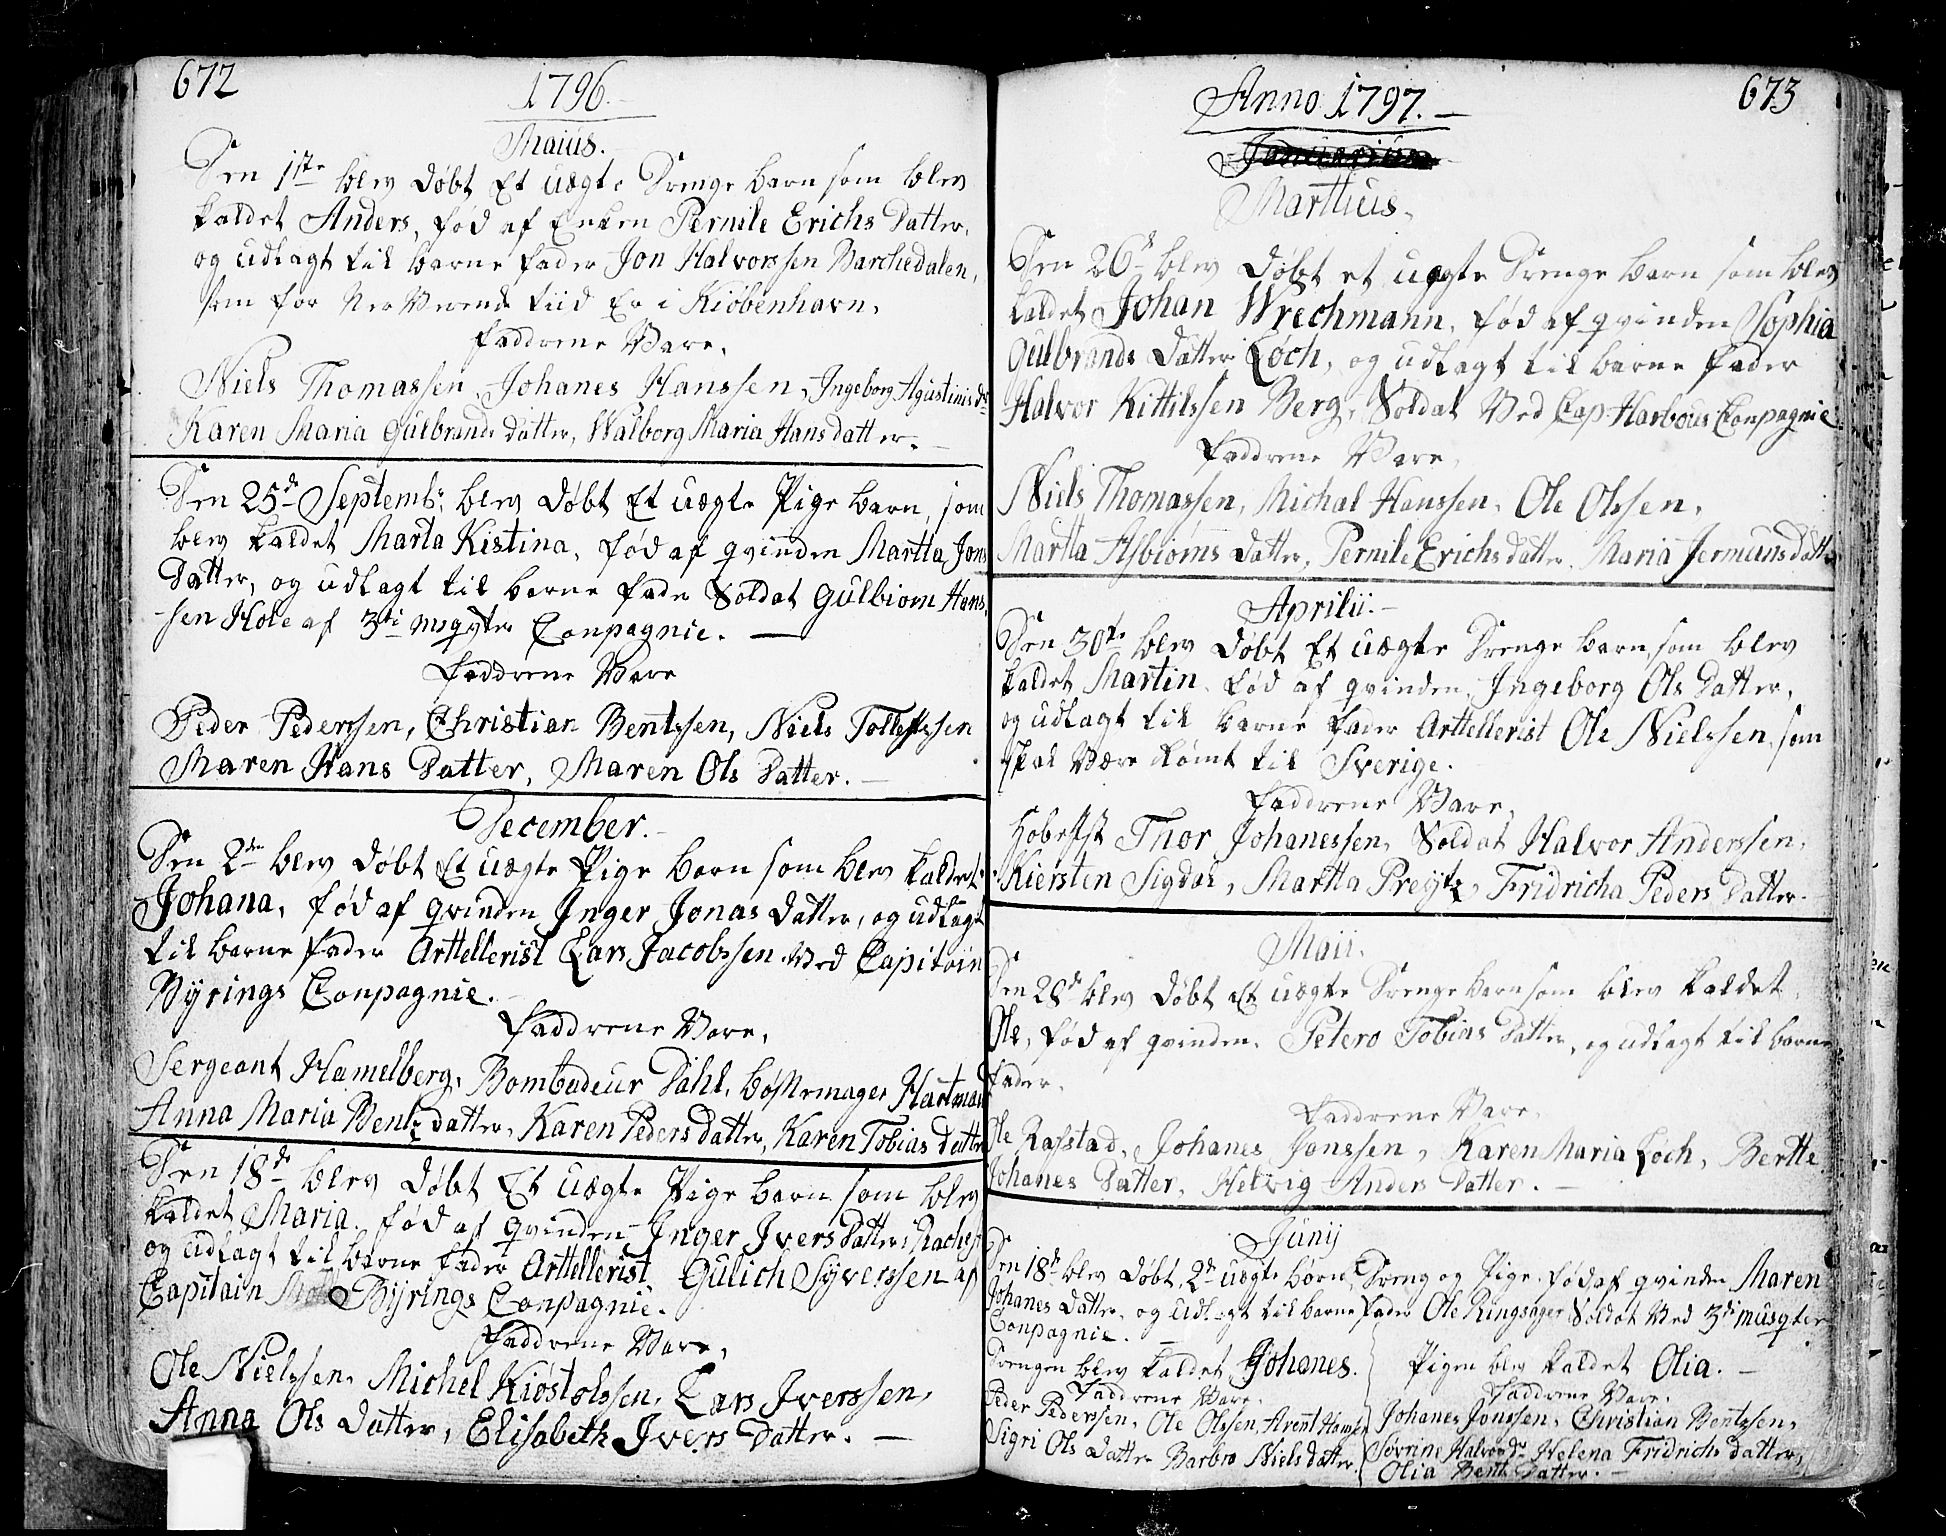 SAO, Fredrikstad prestekontor Kirkebøker, F/Fa/L0002: Ministerialbok nr. 2, 1750-1804, s. 672-673